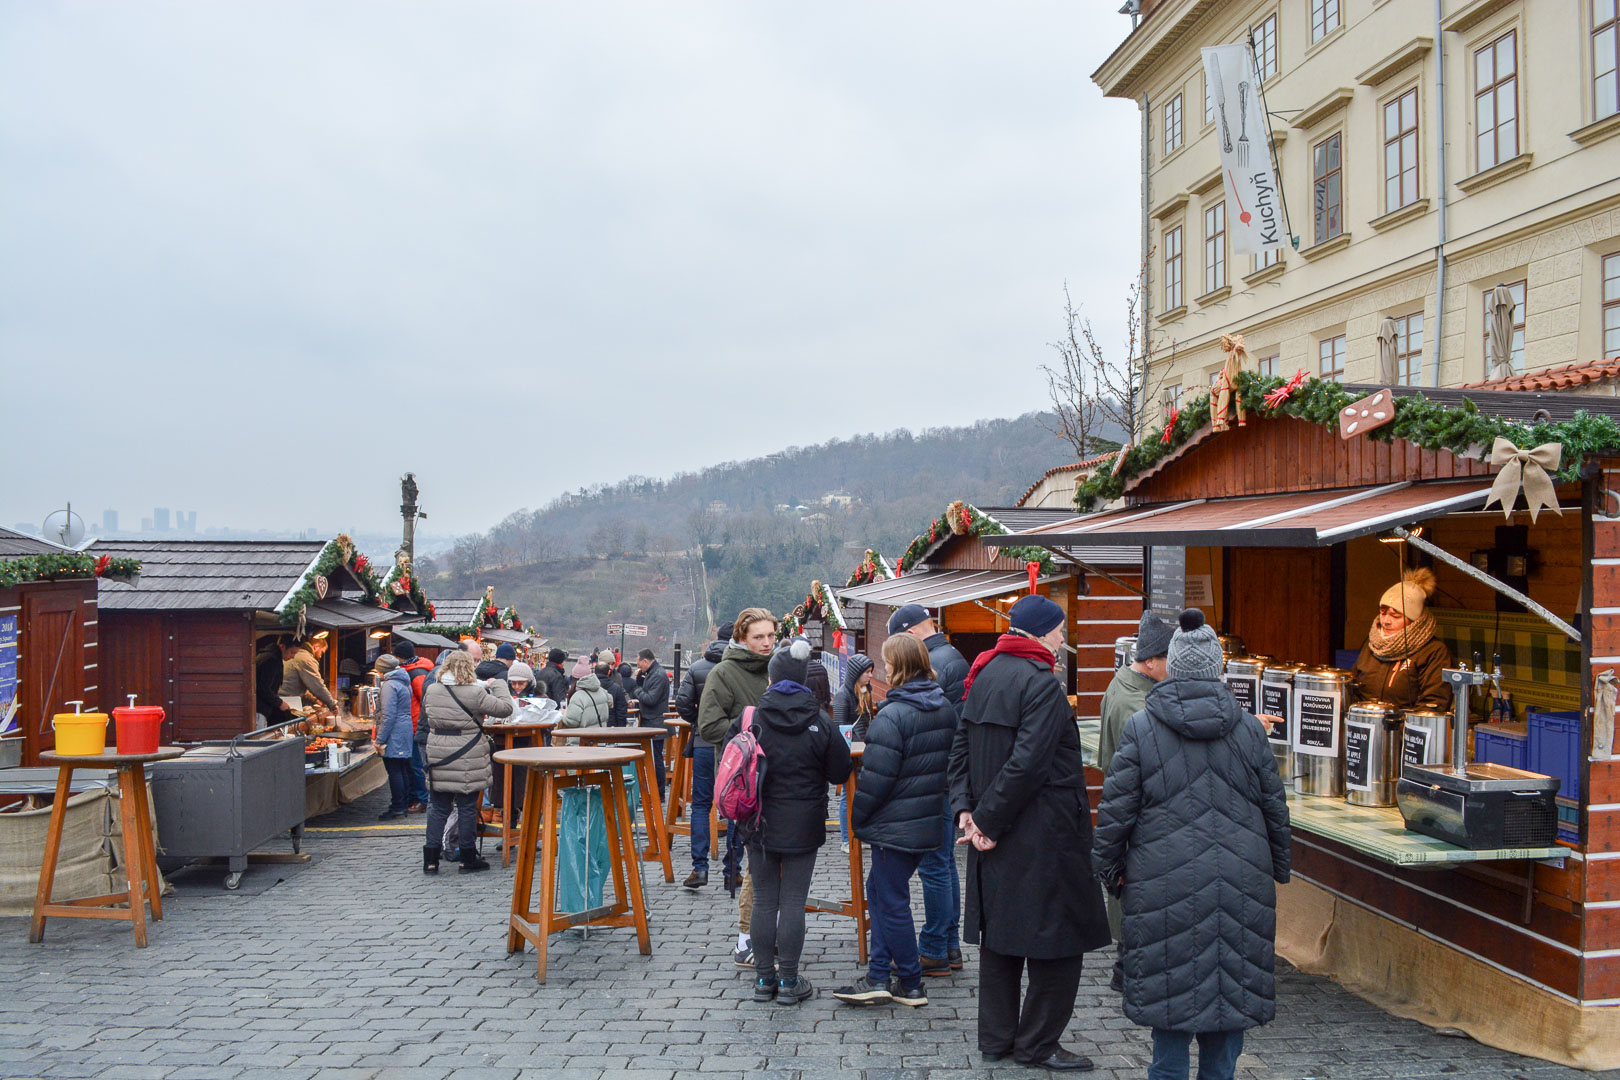 Christmas Market outside of Prague Castle